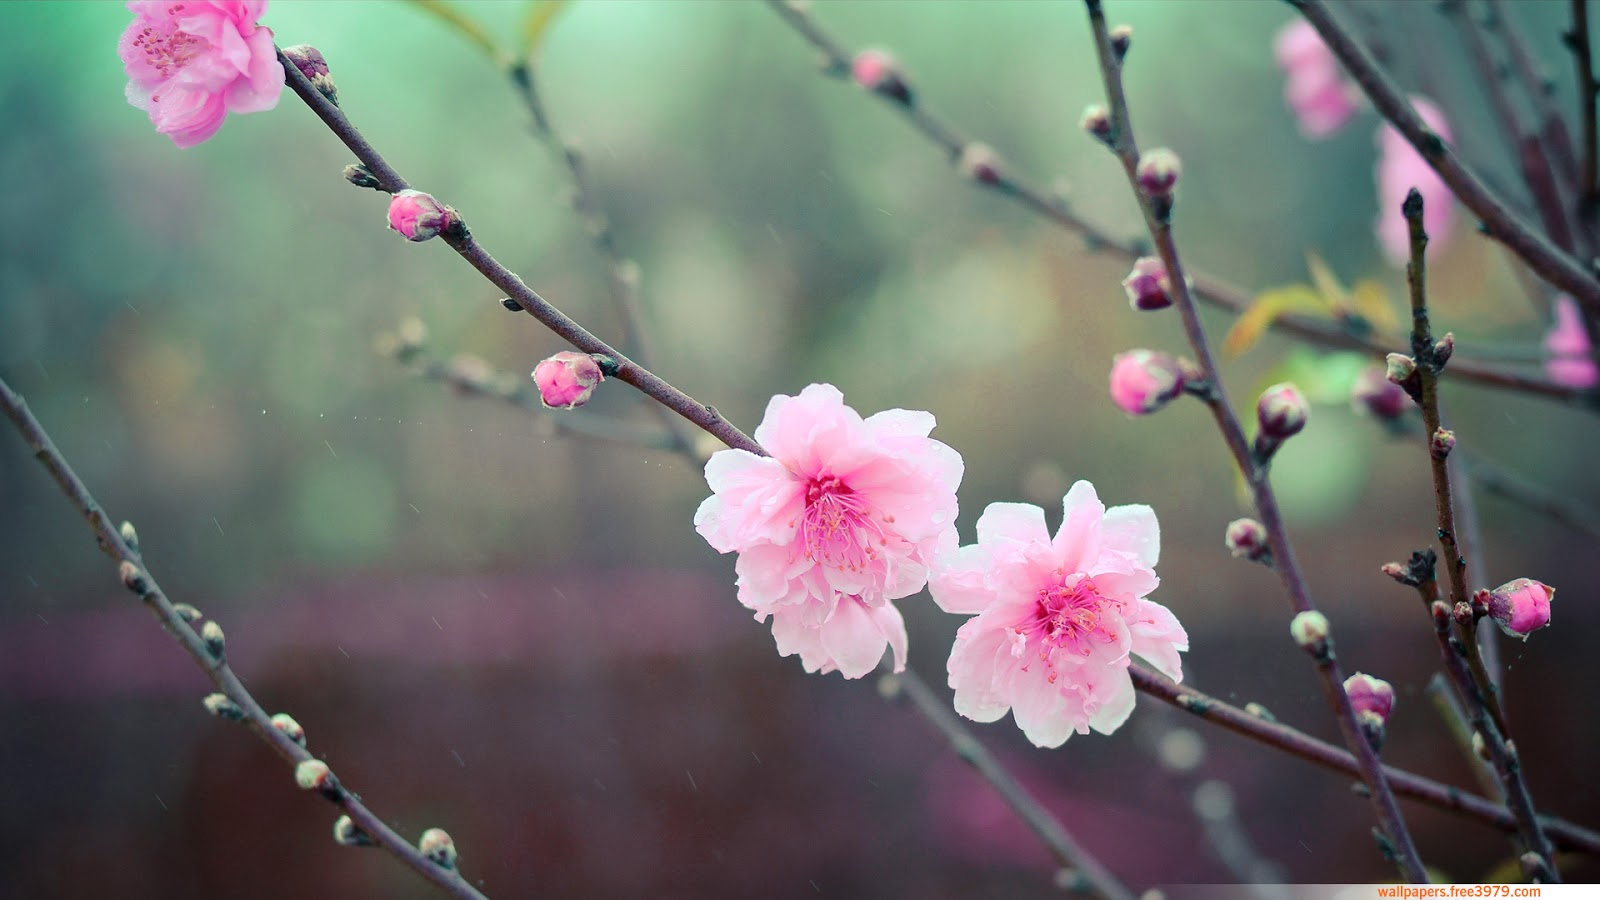 japanese cherry blossom wallpaper 1920x1080 wallpapersafari. Black Bedroom Furniture Sets. Home Design Ideas